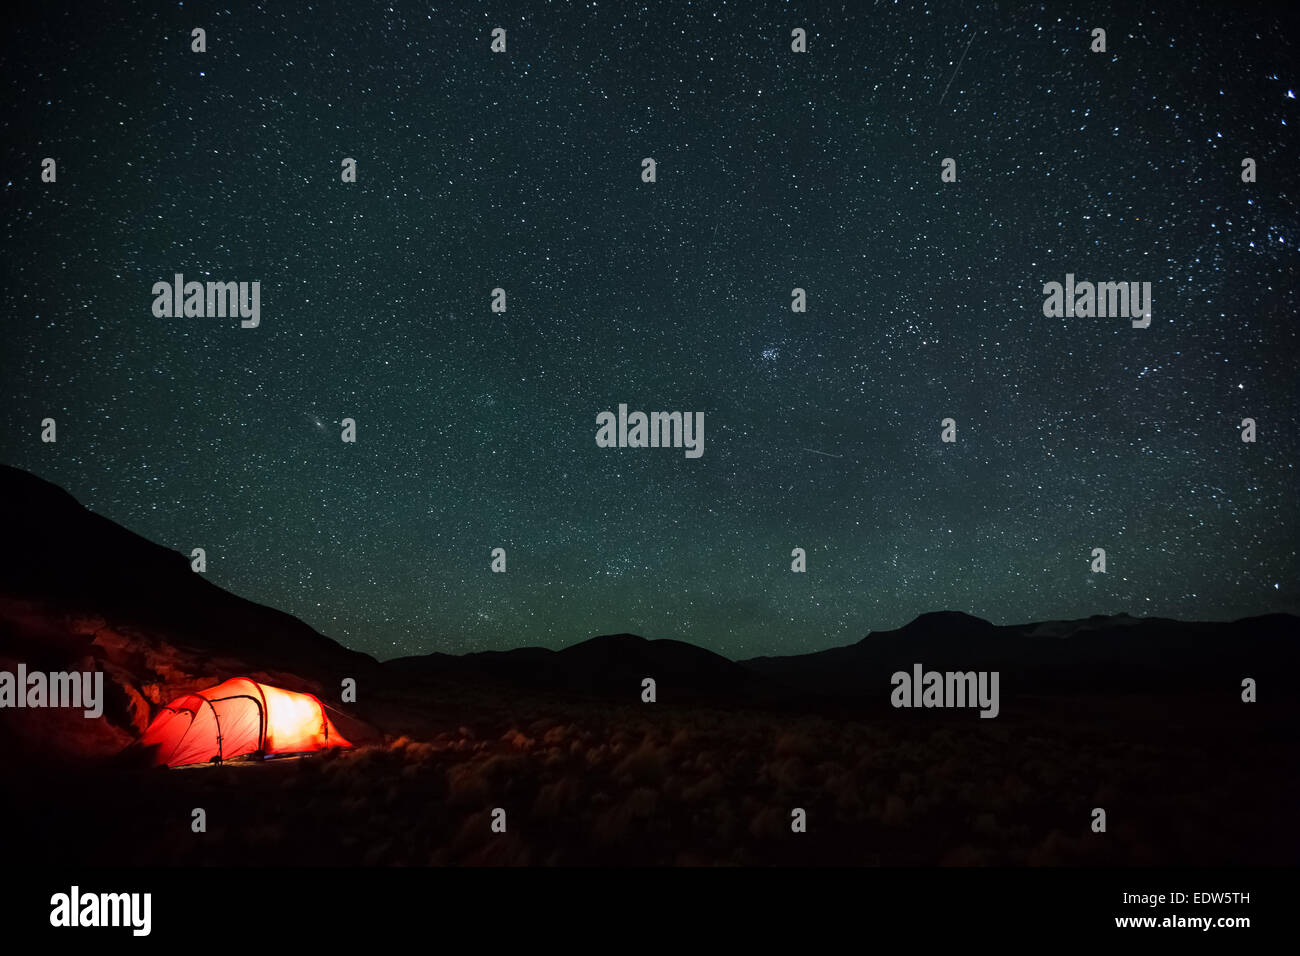 Campeggio al Salar de talari distesa di sale, San Pedro de Atacama, Cile, Sud America Immagini Stock